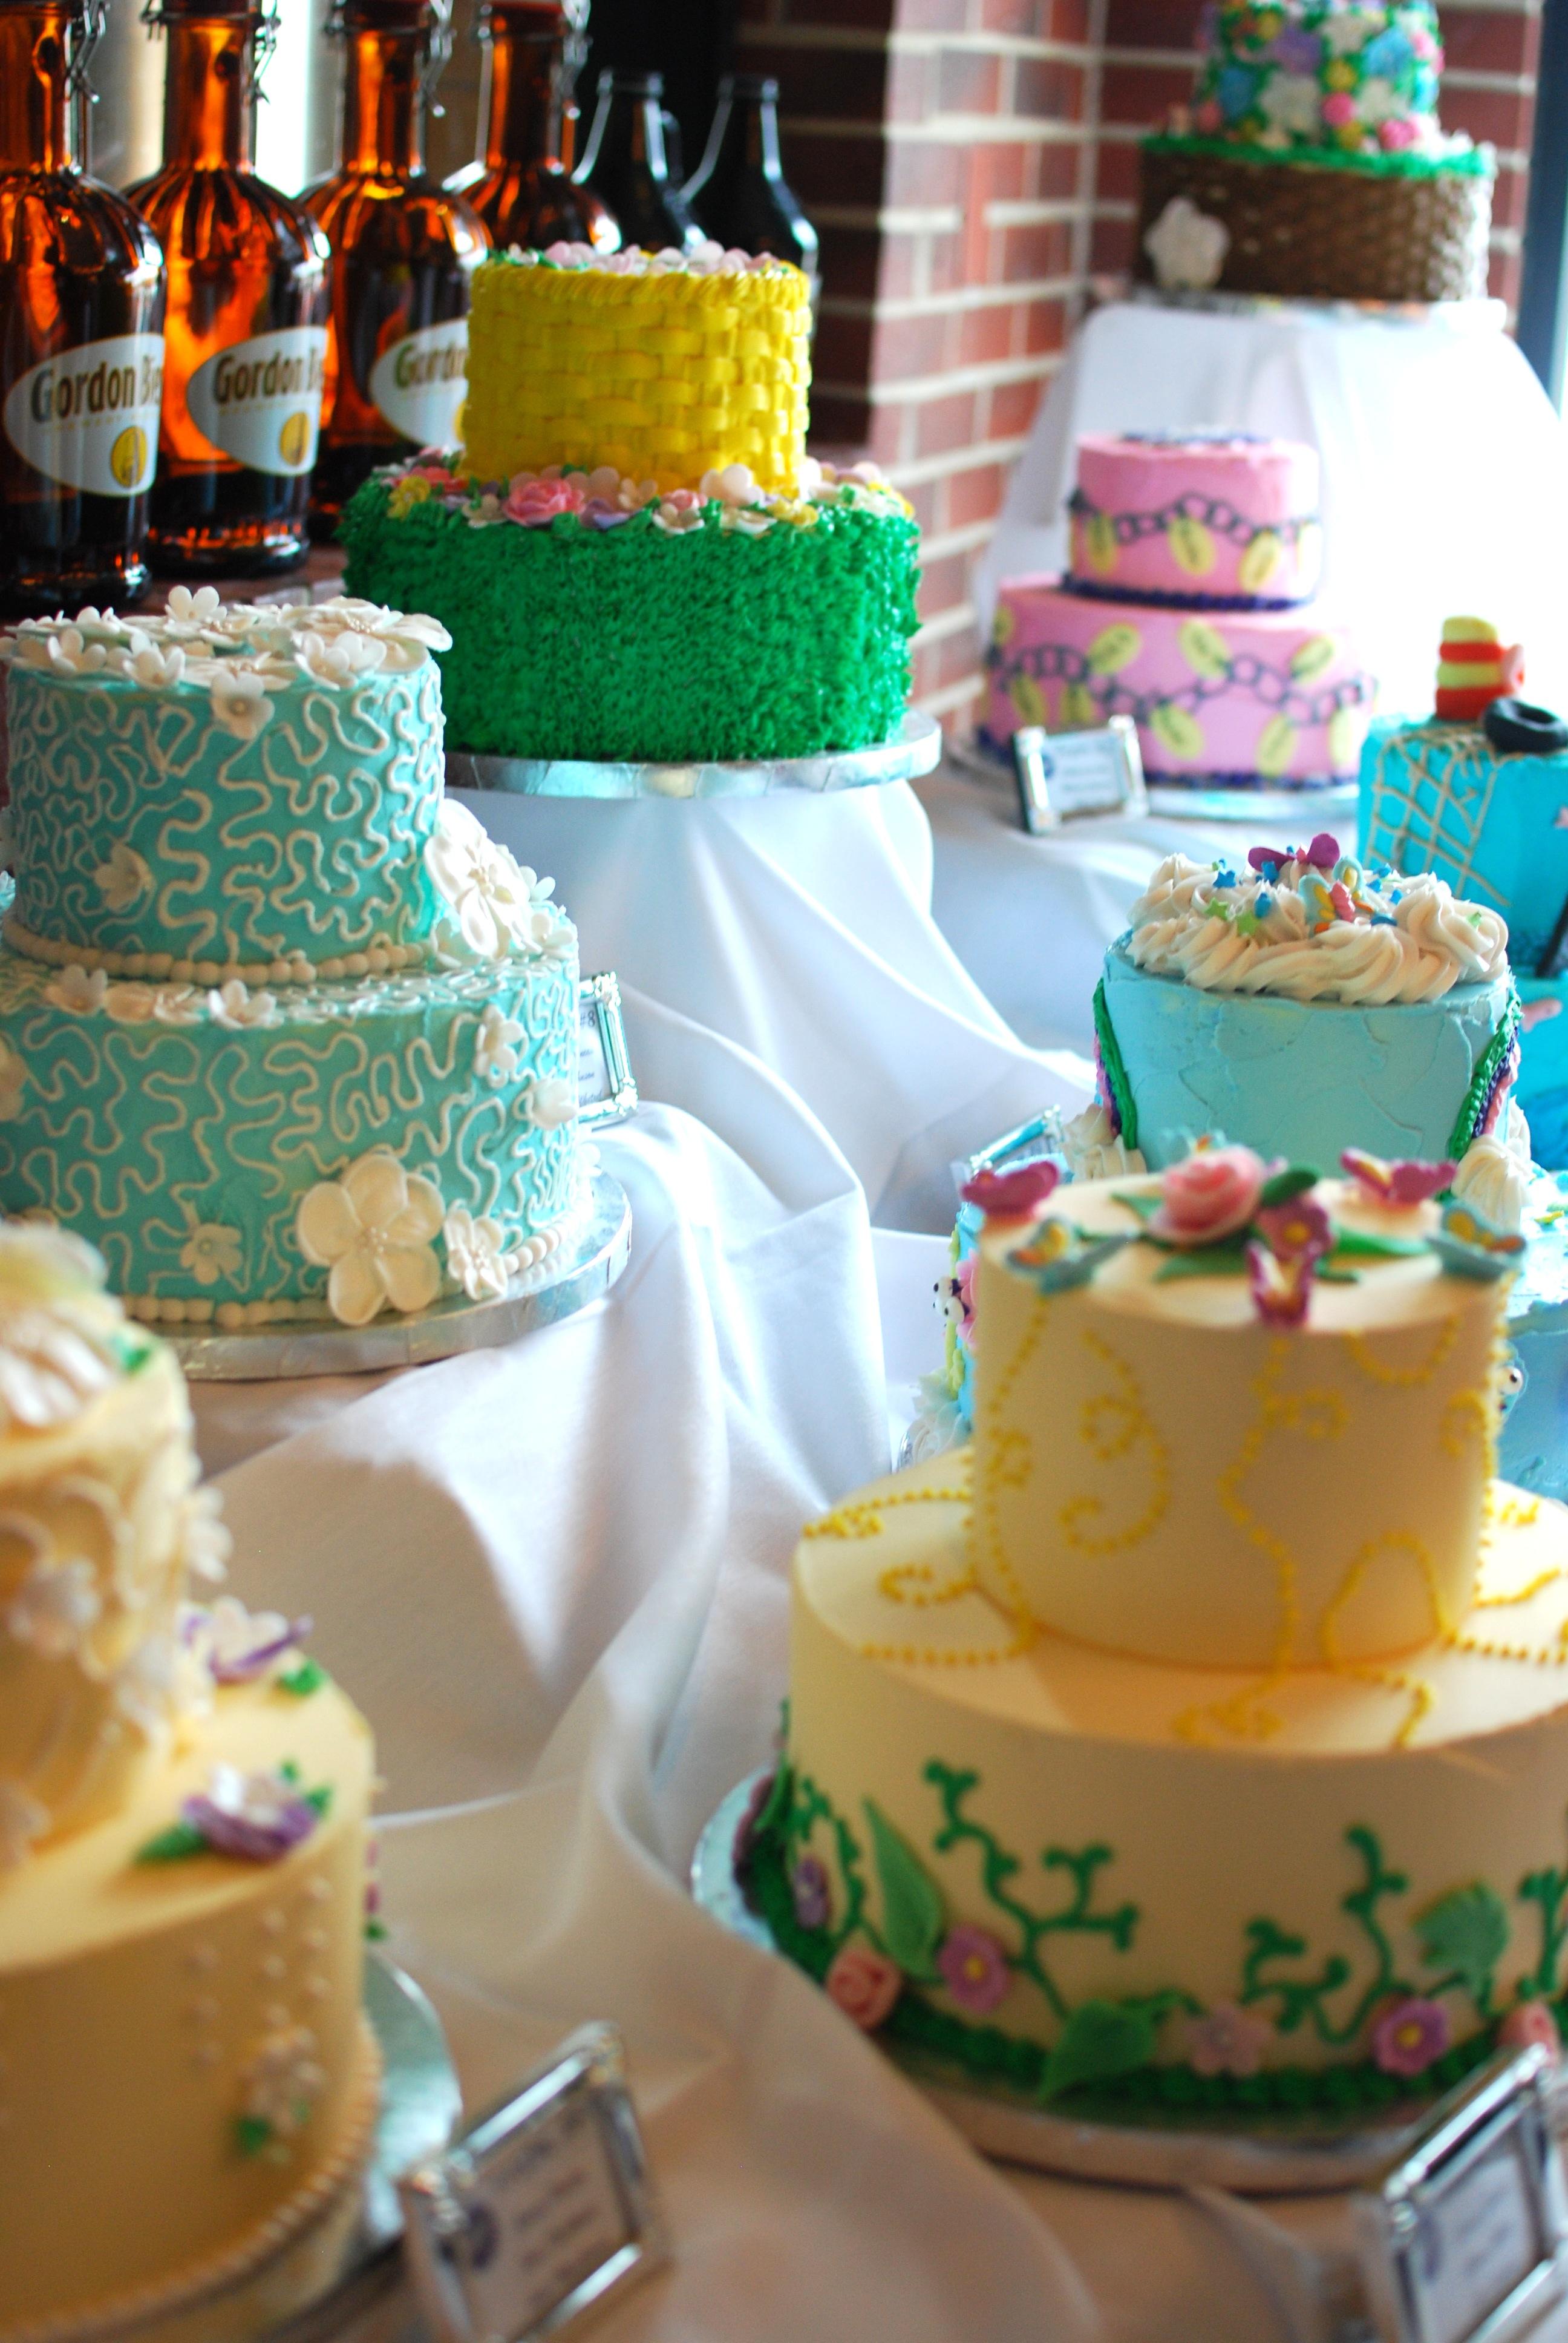 Cake Decorating Supplies Sydney City